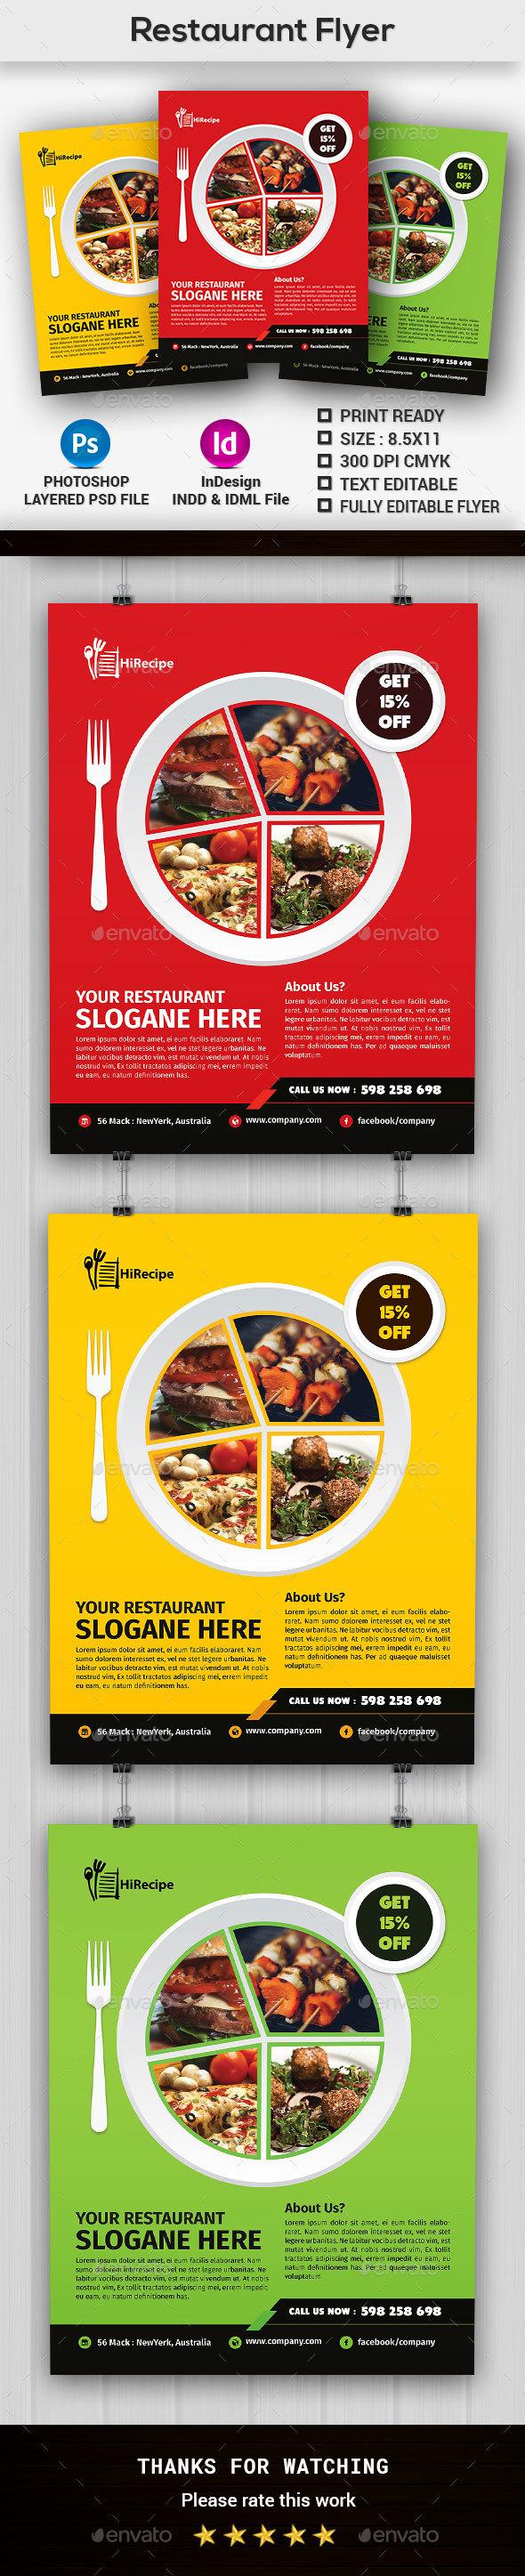 Restaurant Flyer Template